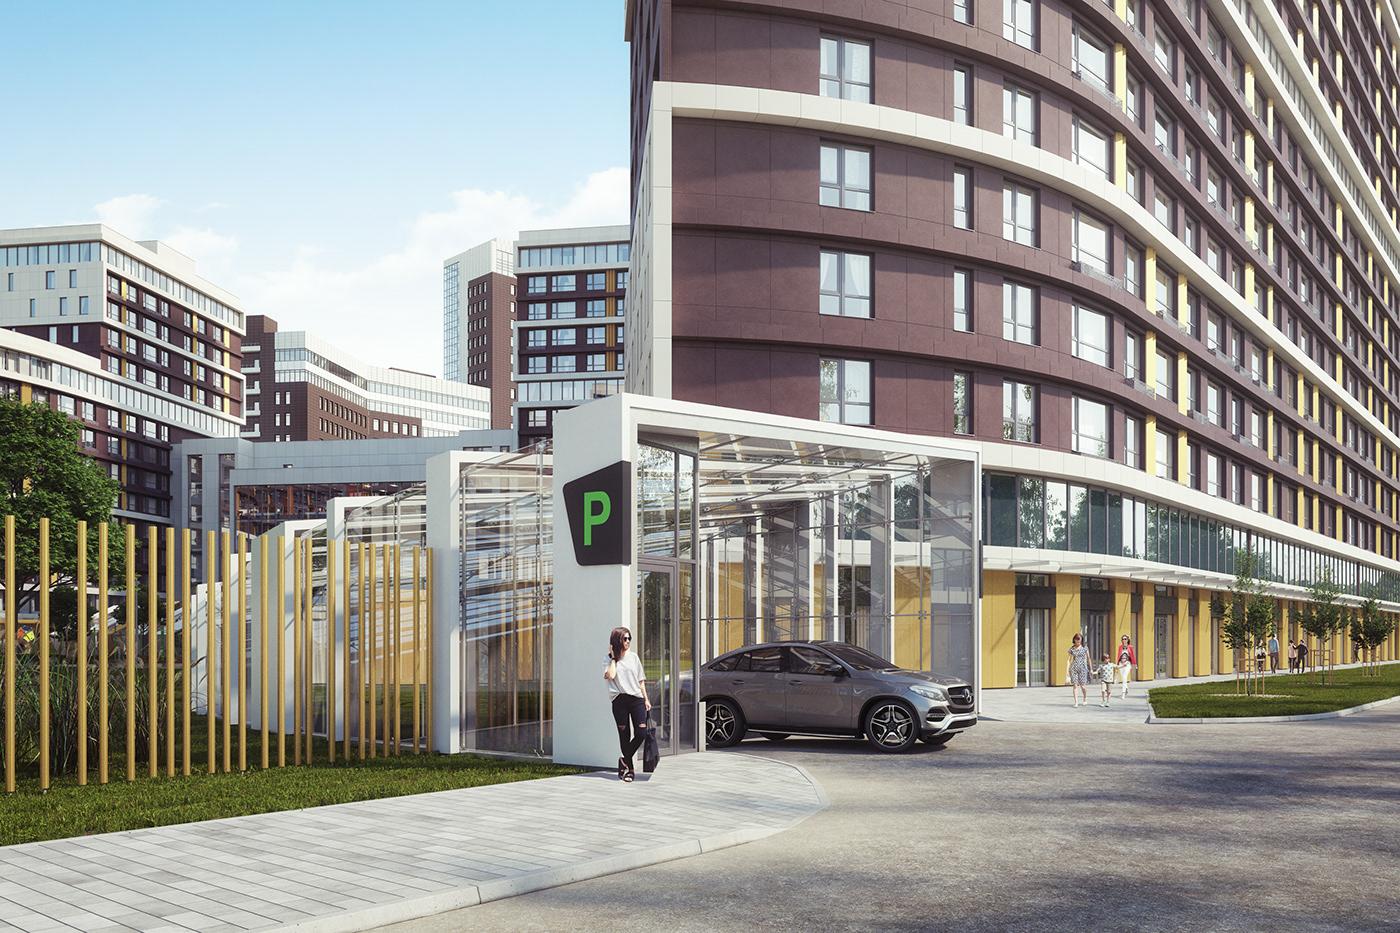 3D apartment architecture clever constructing granum modeling modelling Park visualization